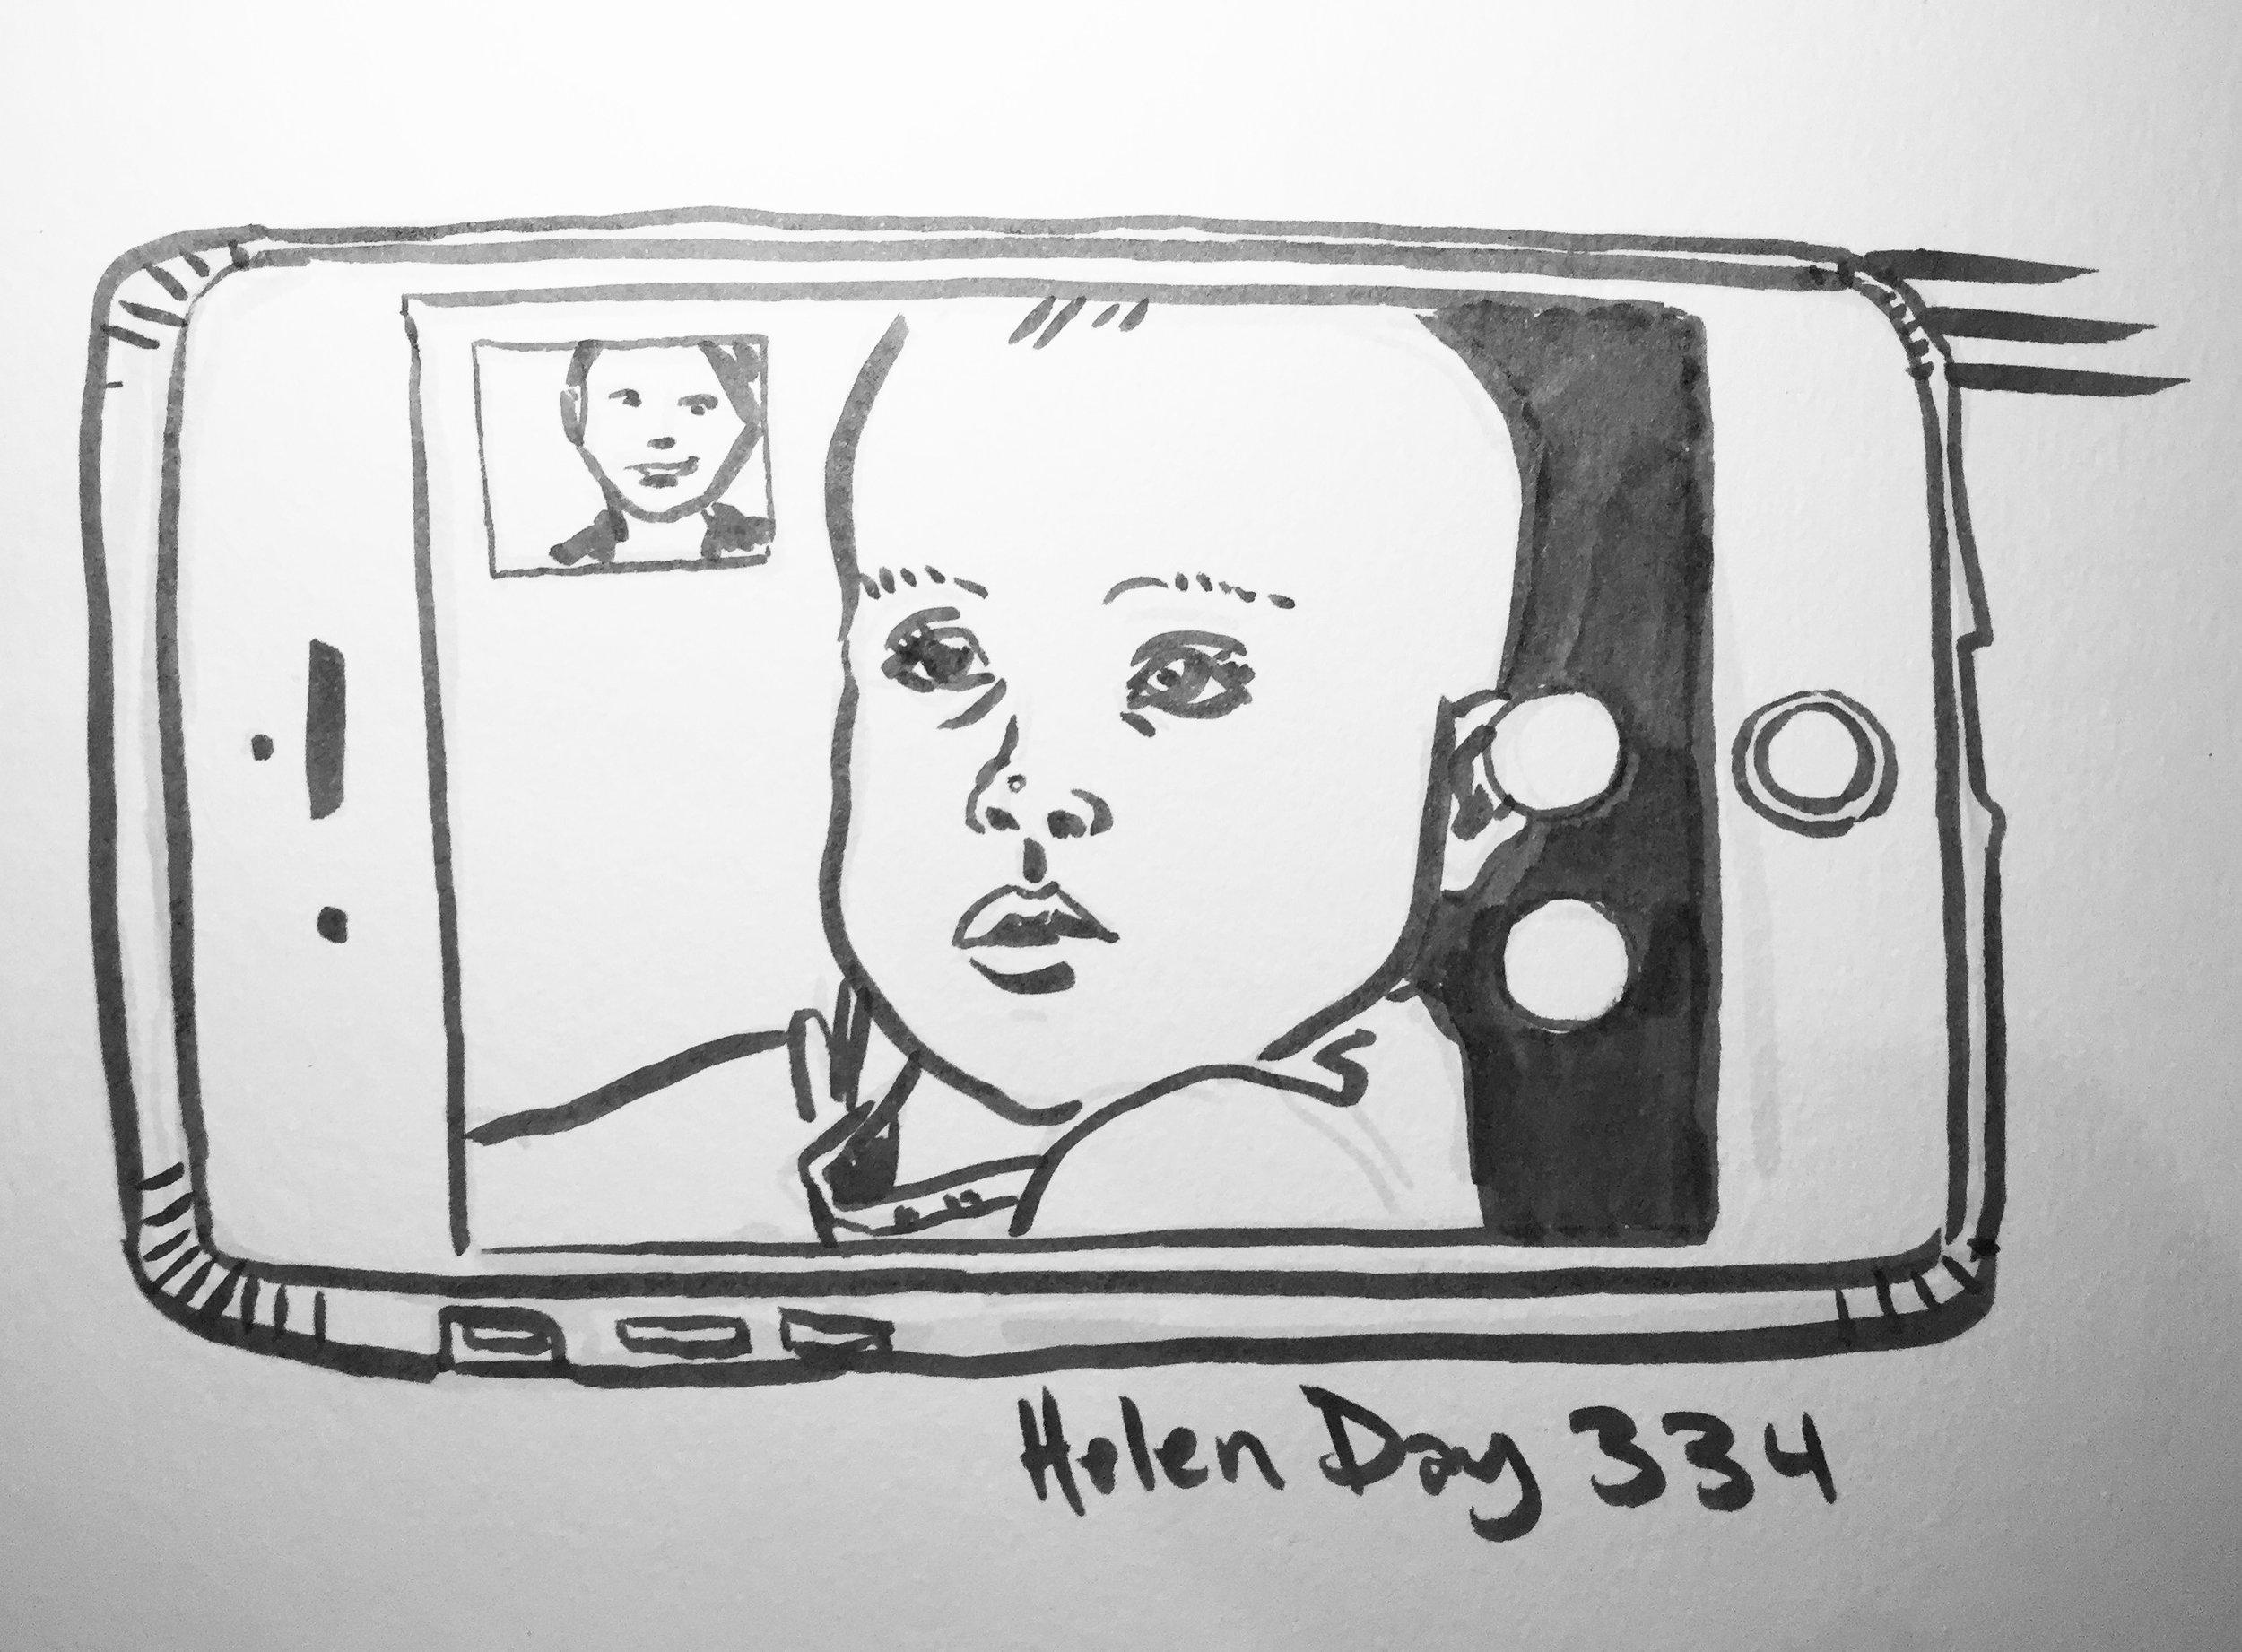 dailyhelen 334.JPG